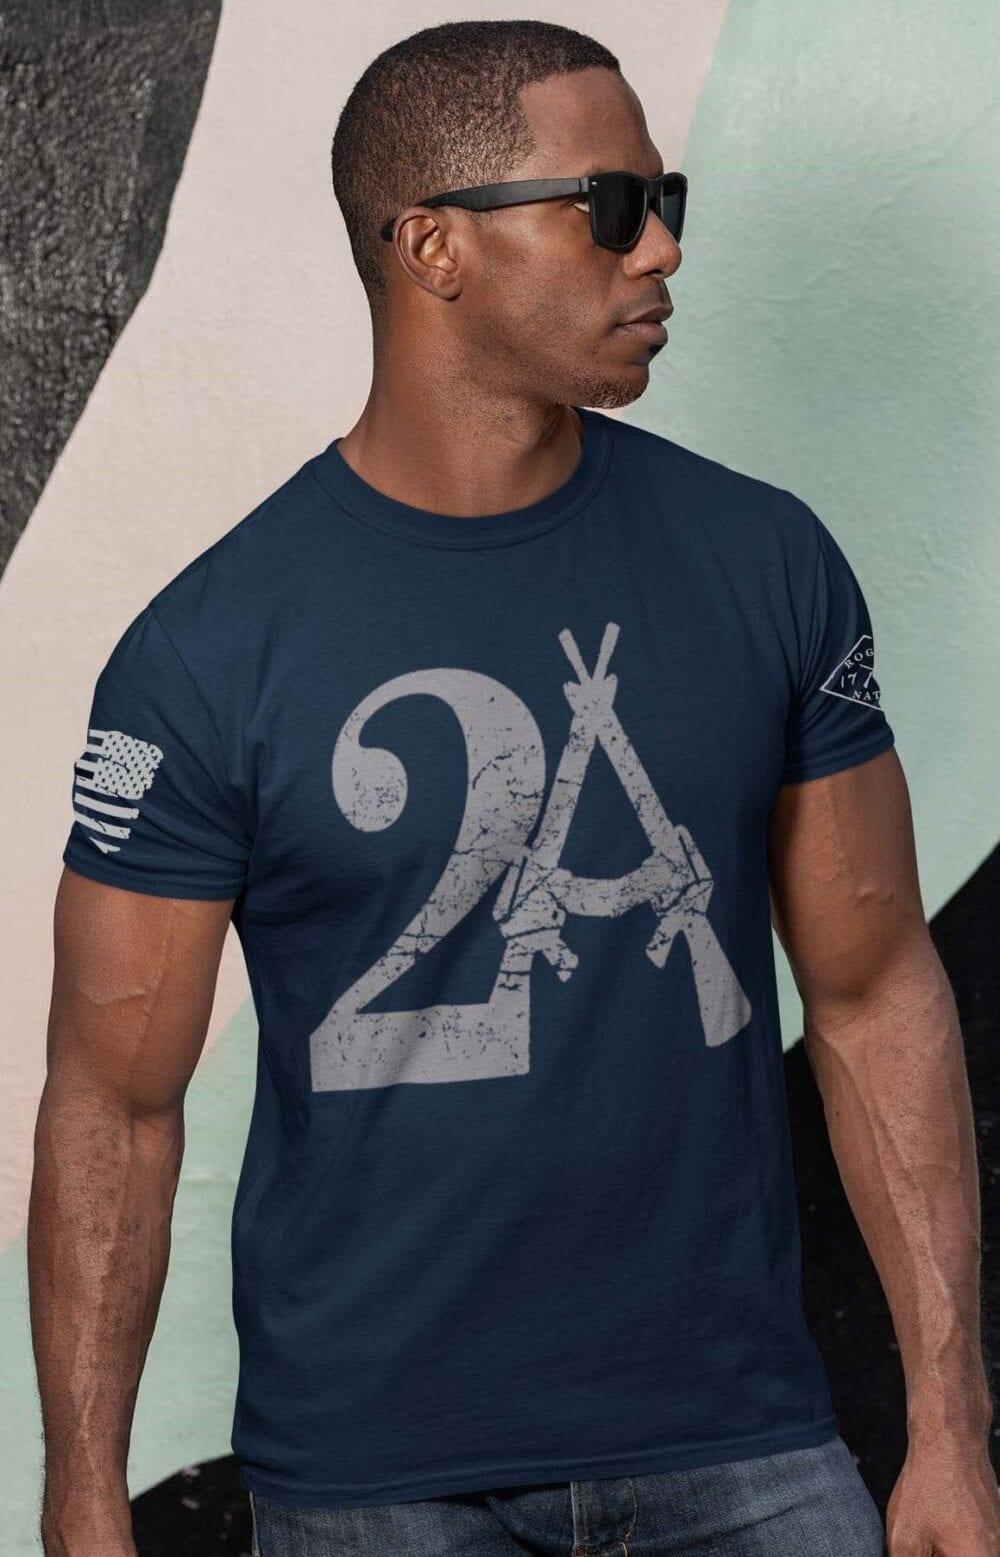 2A on Mens Navy Blue T-Shirt